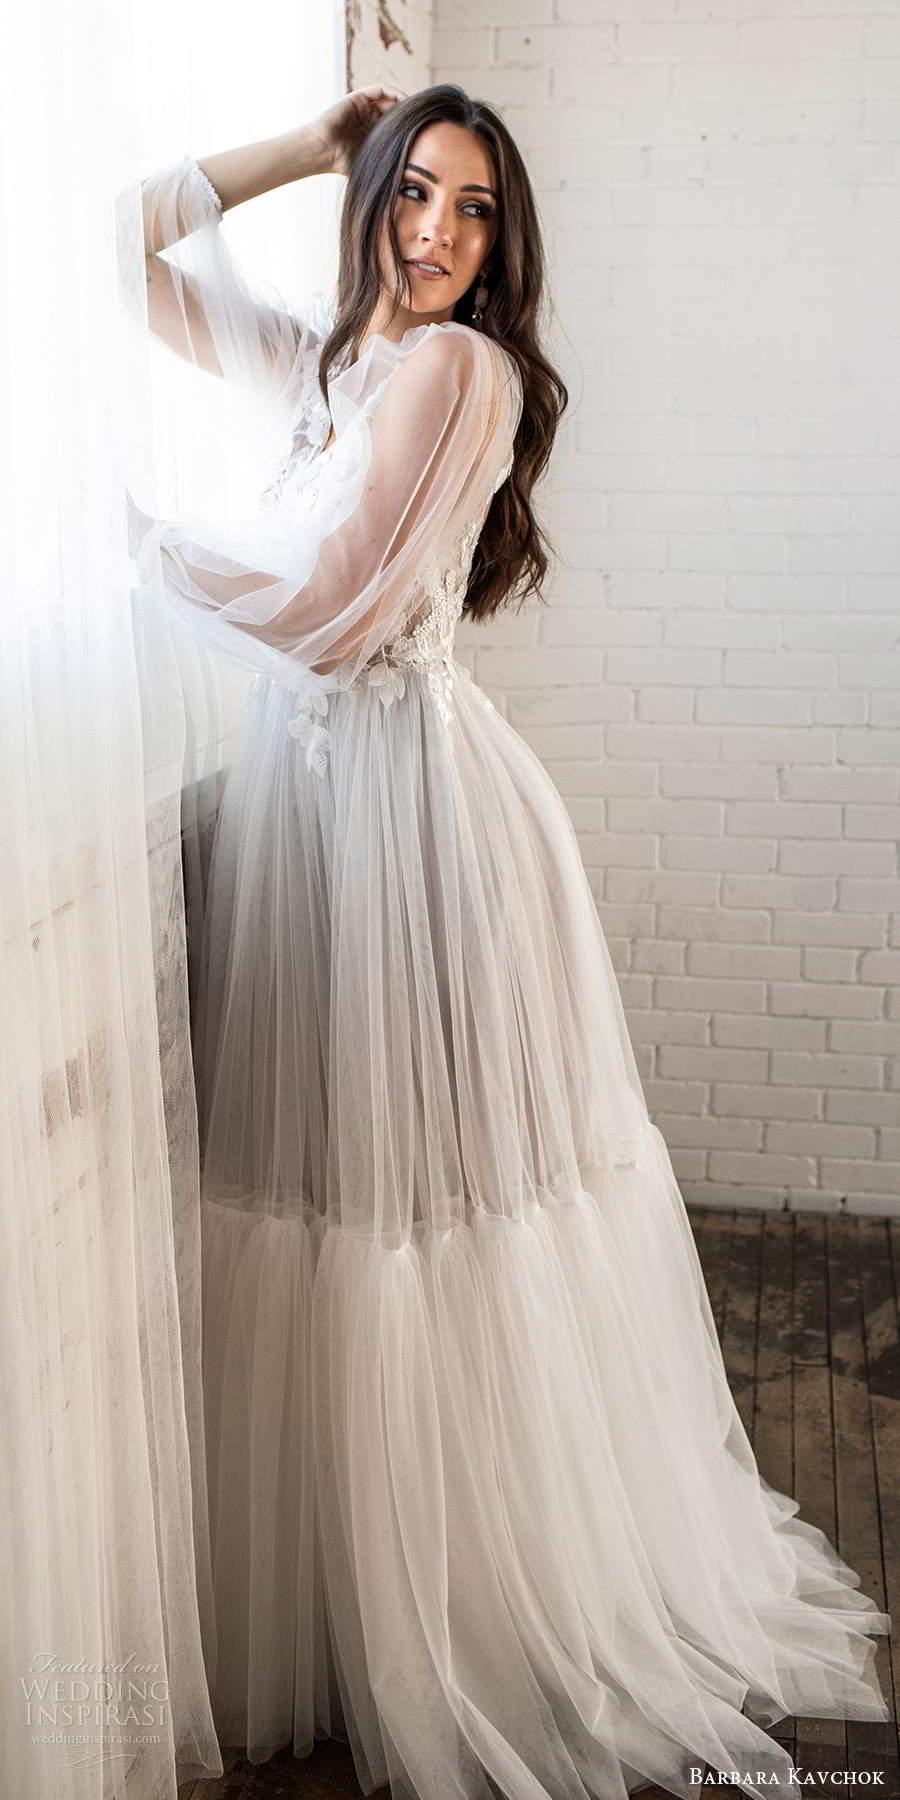 barbara kavchok fall 2020 bridal illusion long poet sleeves v neckline embellished lace bodice a line ball gown wedding dress keyhole back chapel train (10) sv